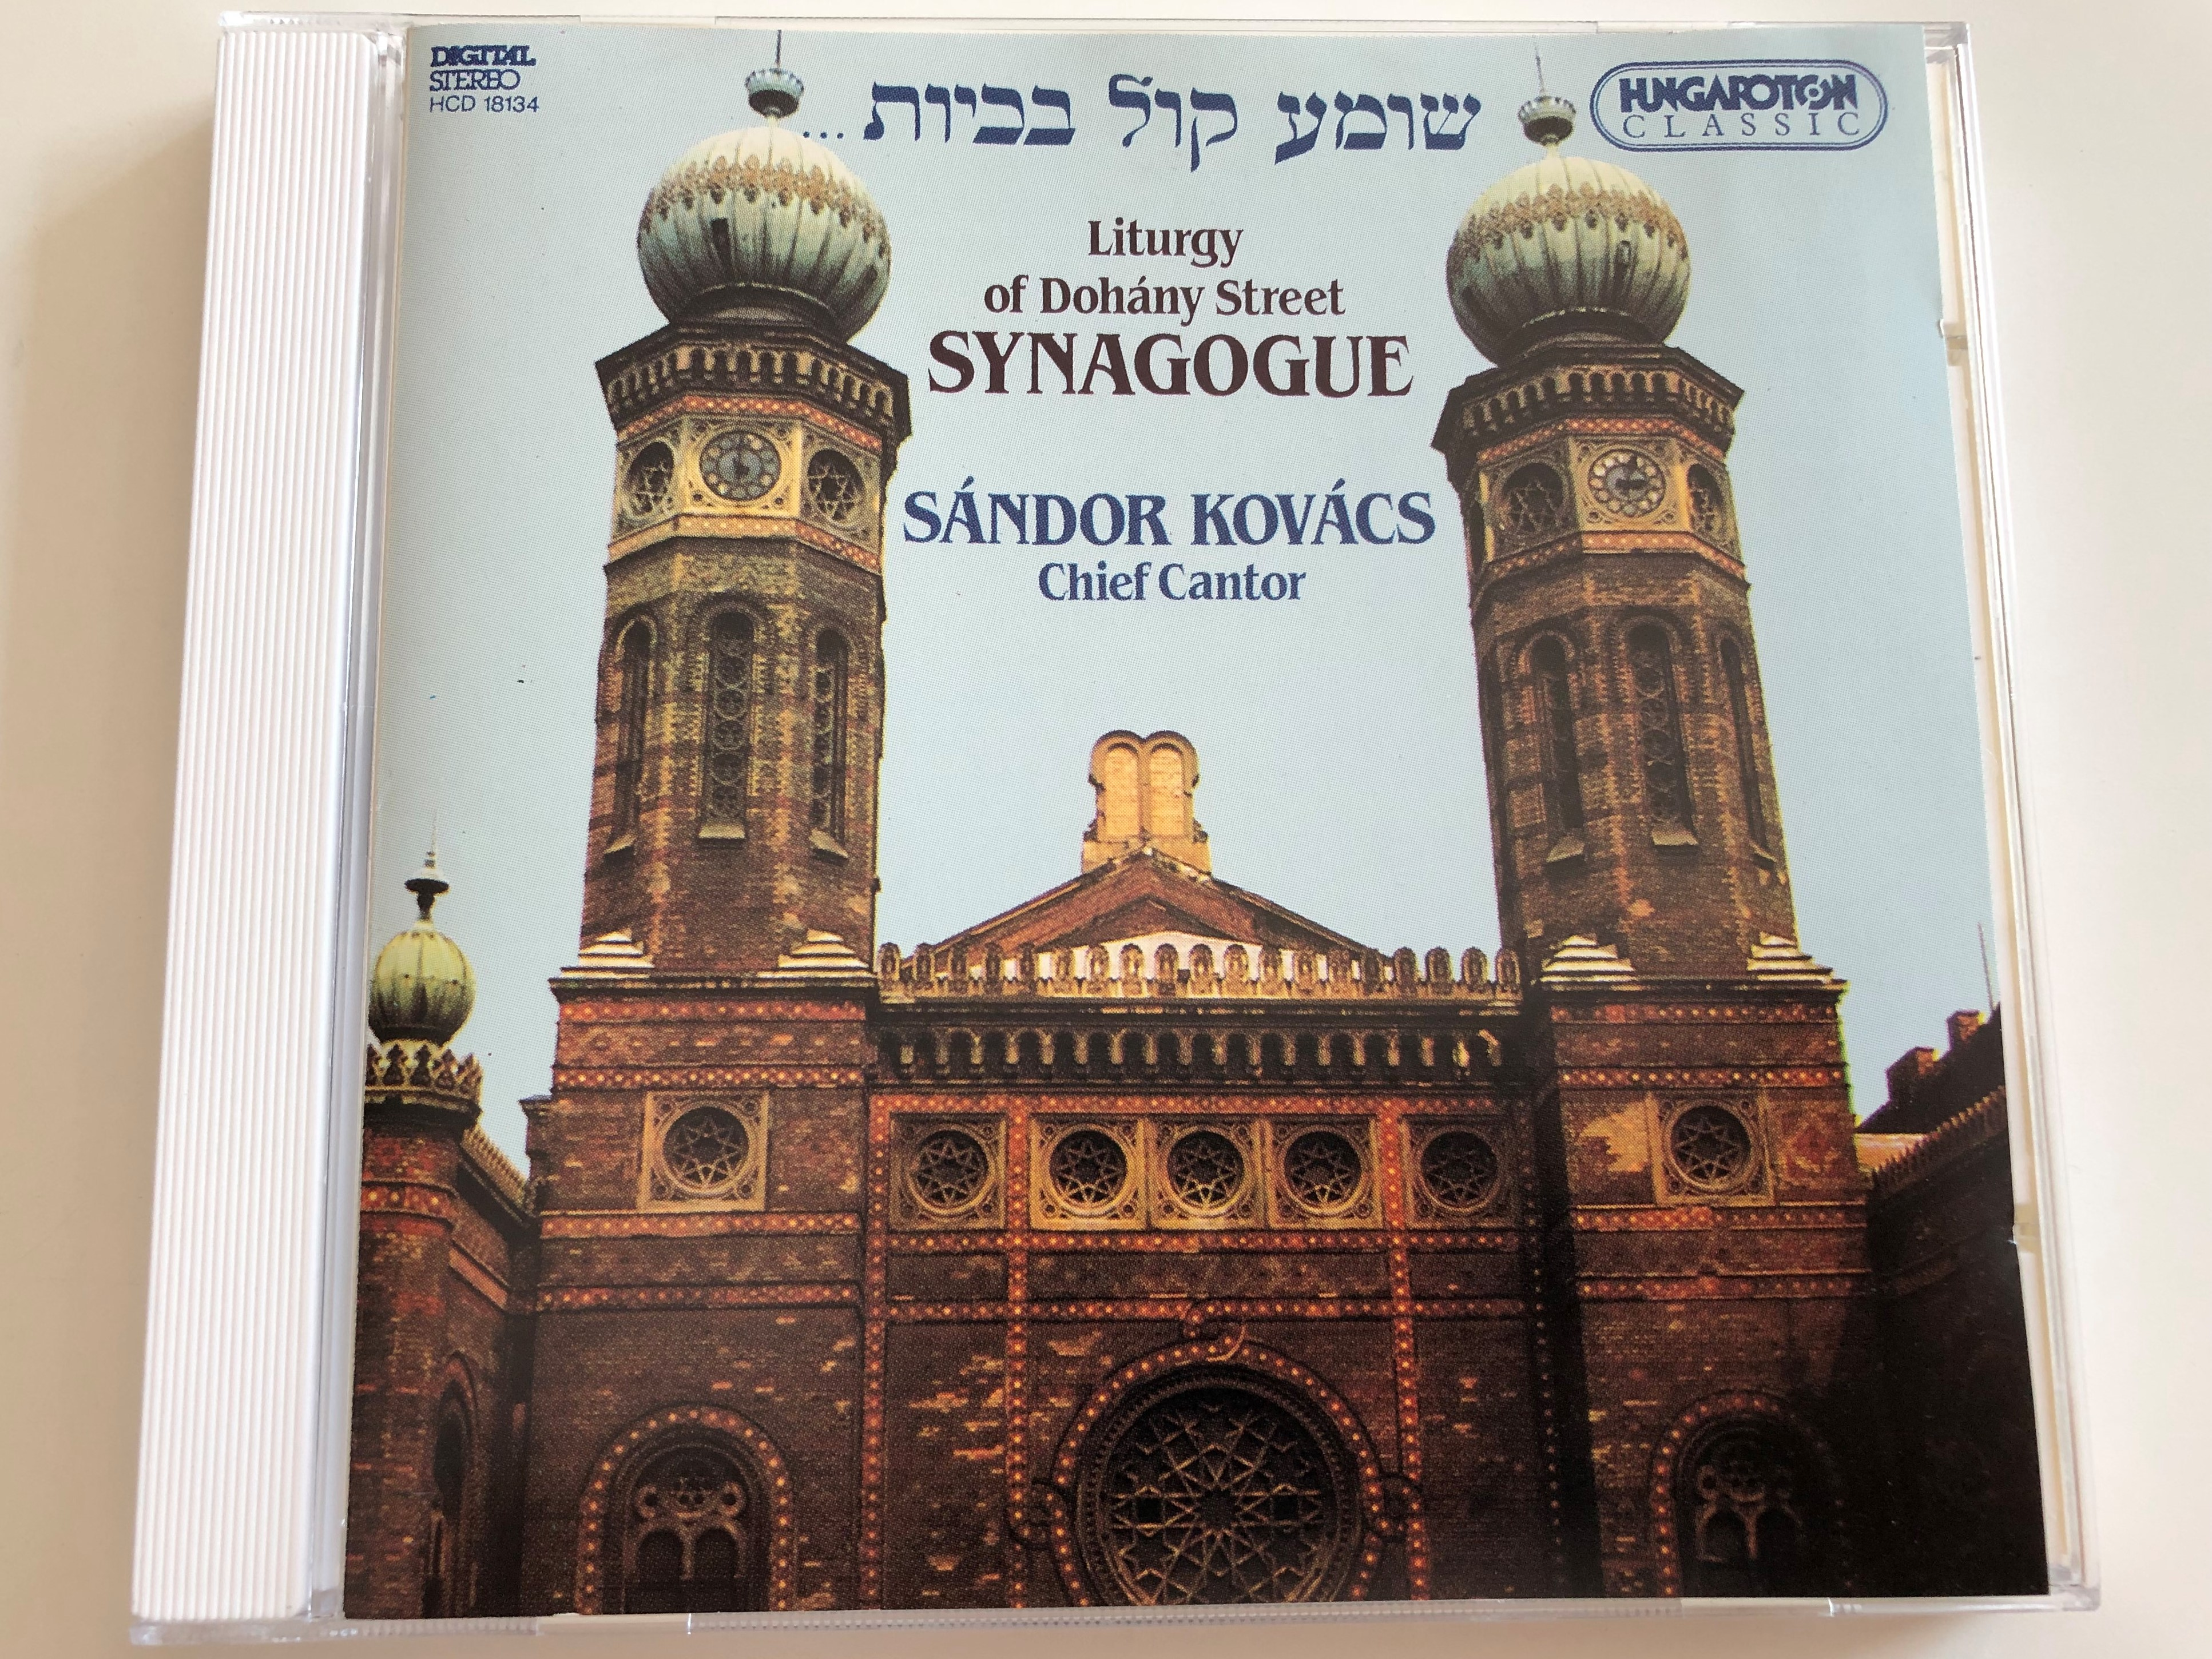 liturgy-of-doh-ny-street-synagogue-s-ndor-kov-cs-chief-cantor-hungaroton-classic-audio-cd-1994-hcd-18134-1-.jpg